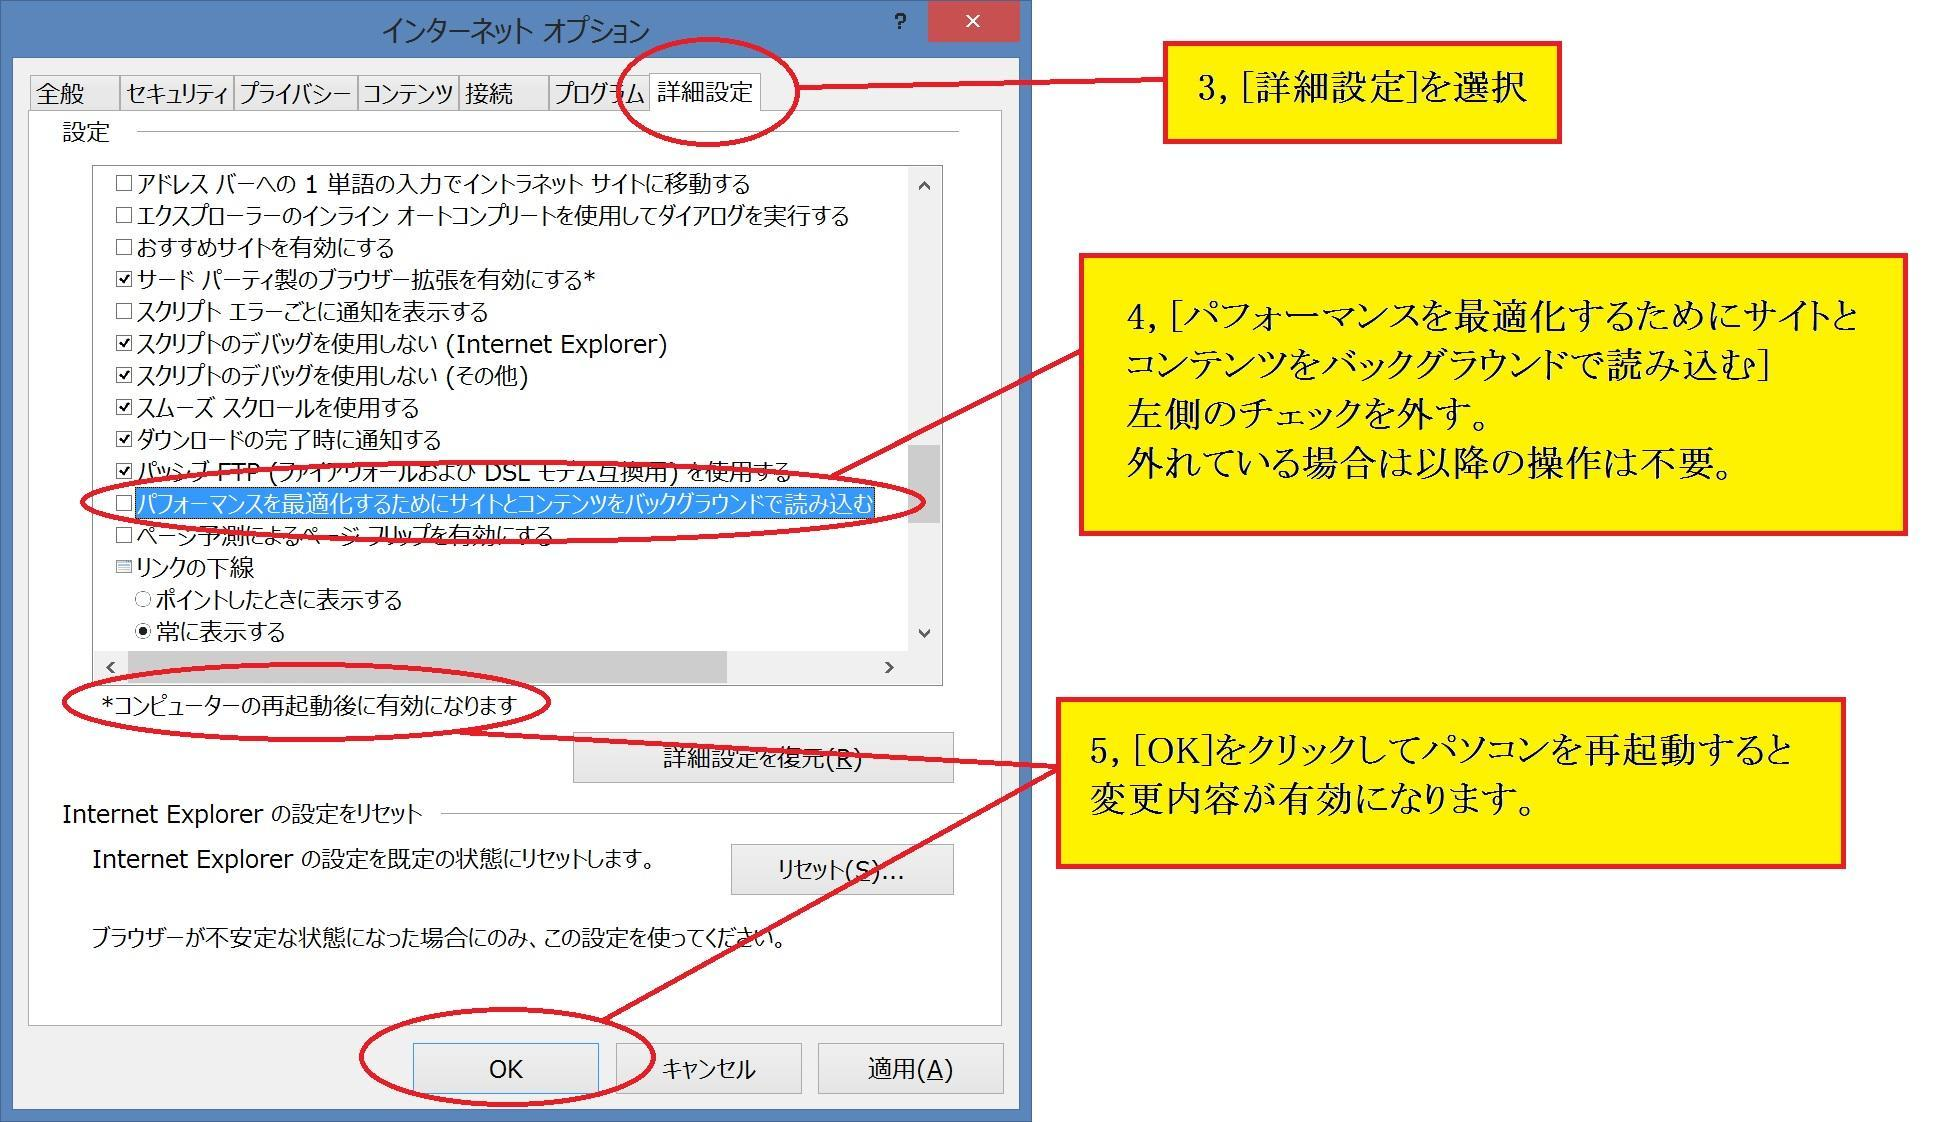 http://www.shinshu-u.ac.jp/institution/library/medicine/uploadimg/ieno2.jpg